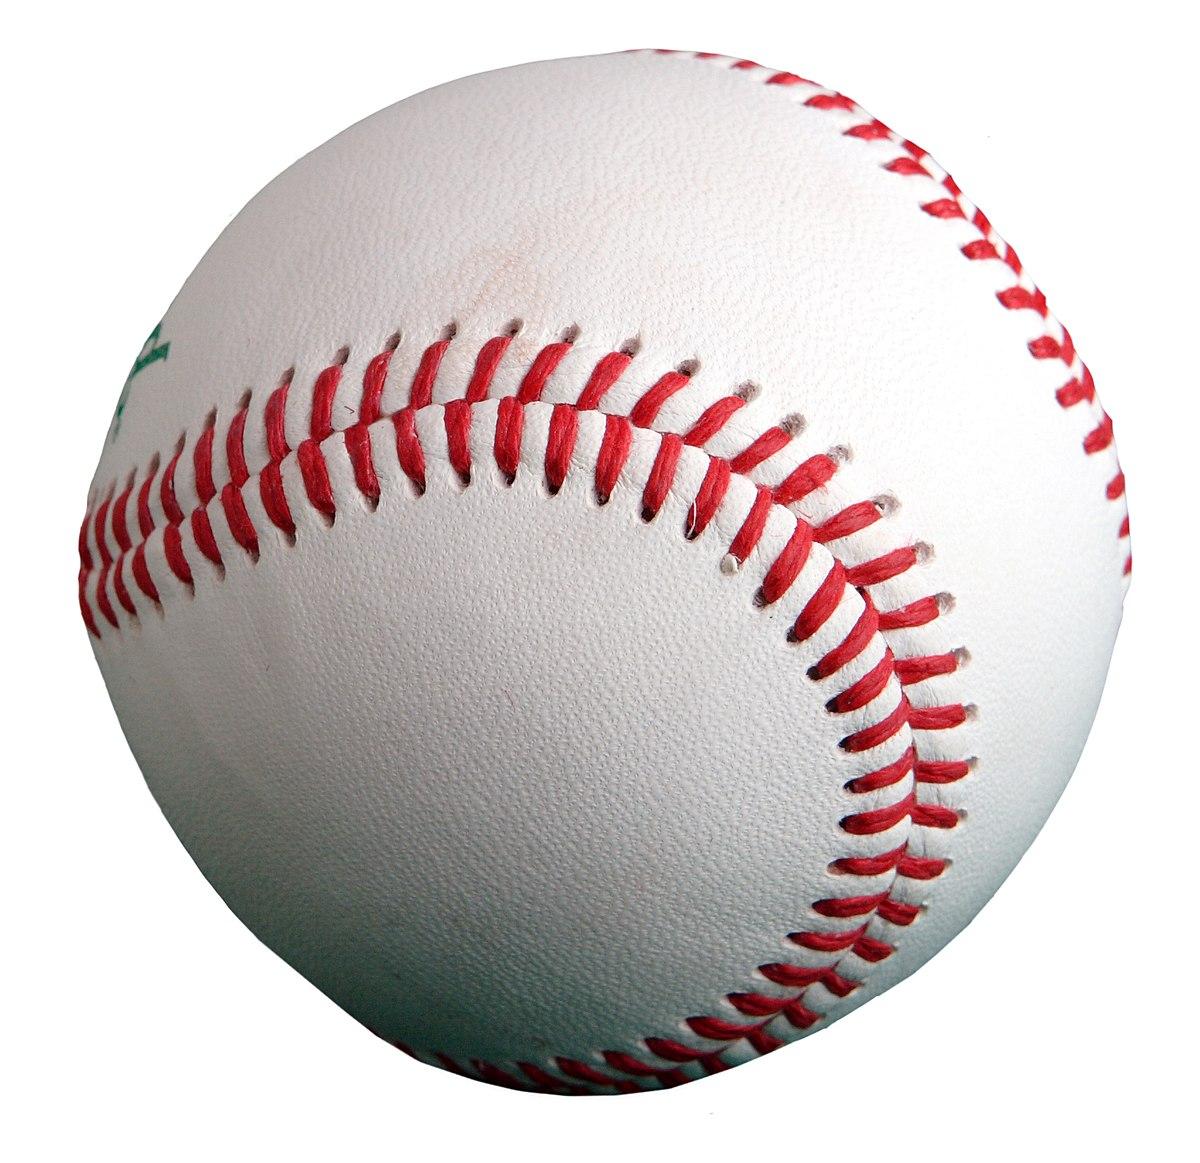 Baseball images